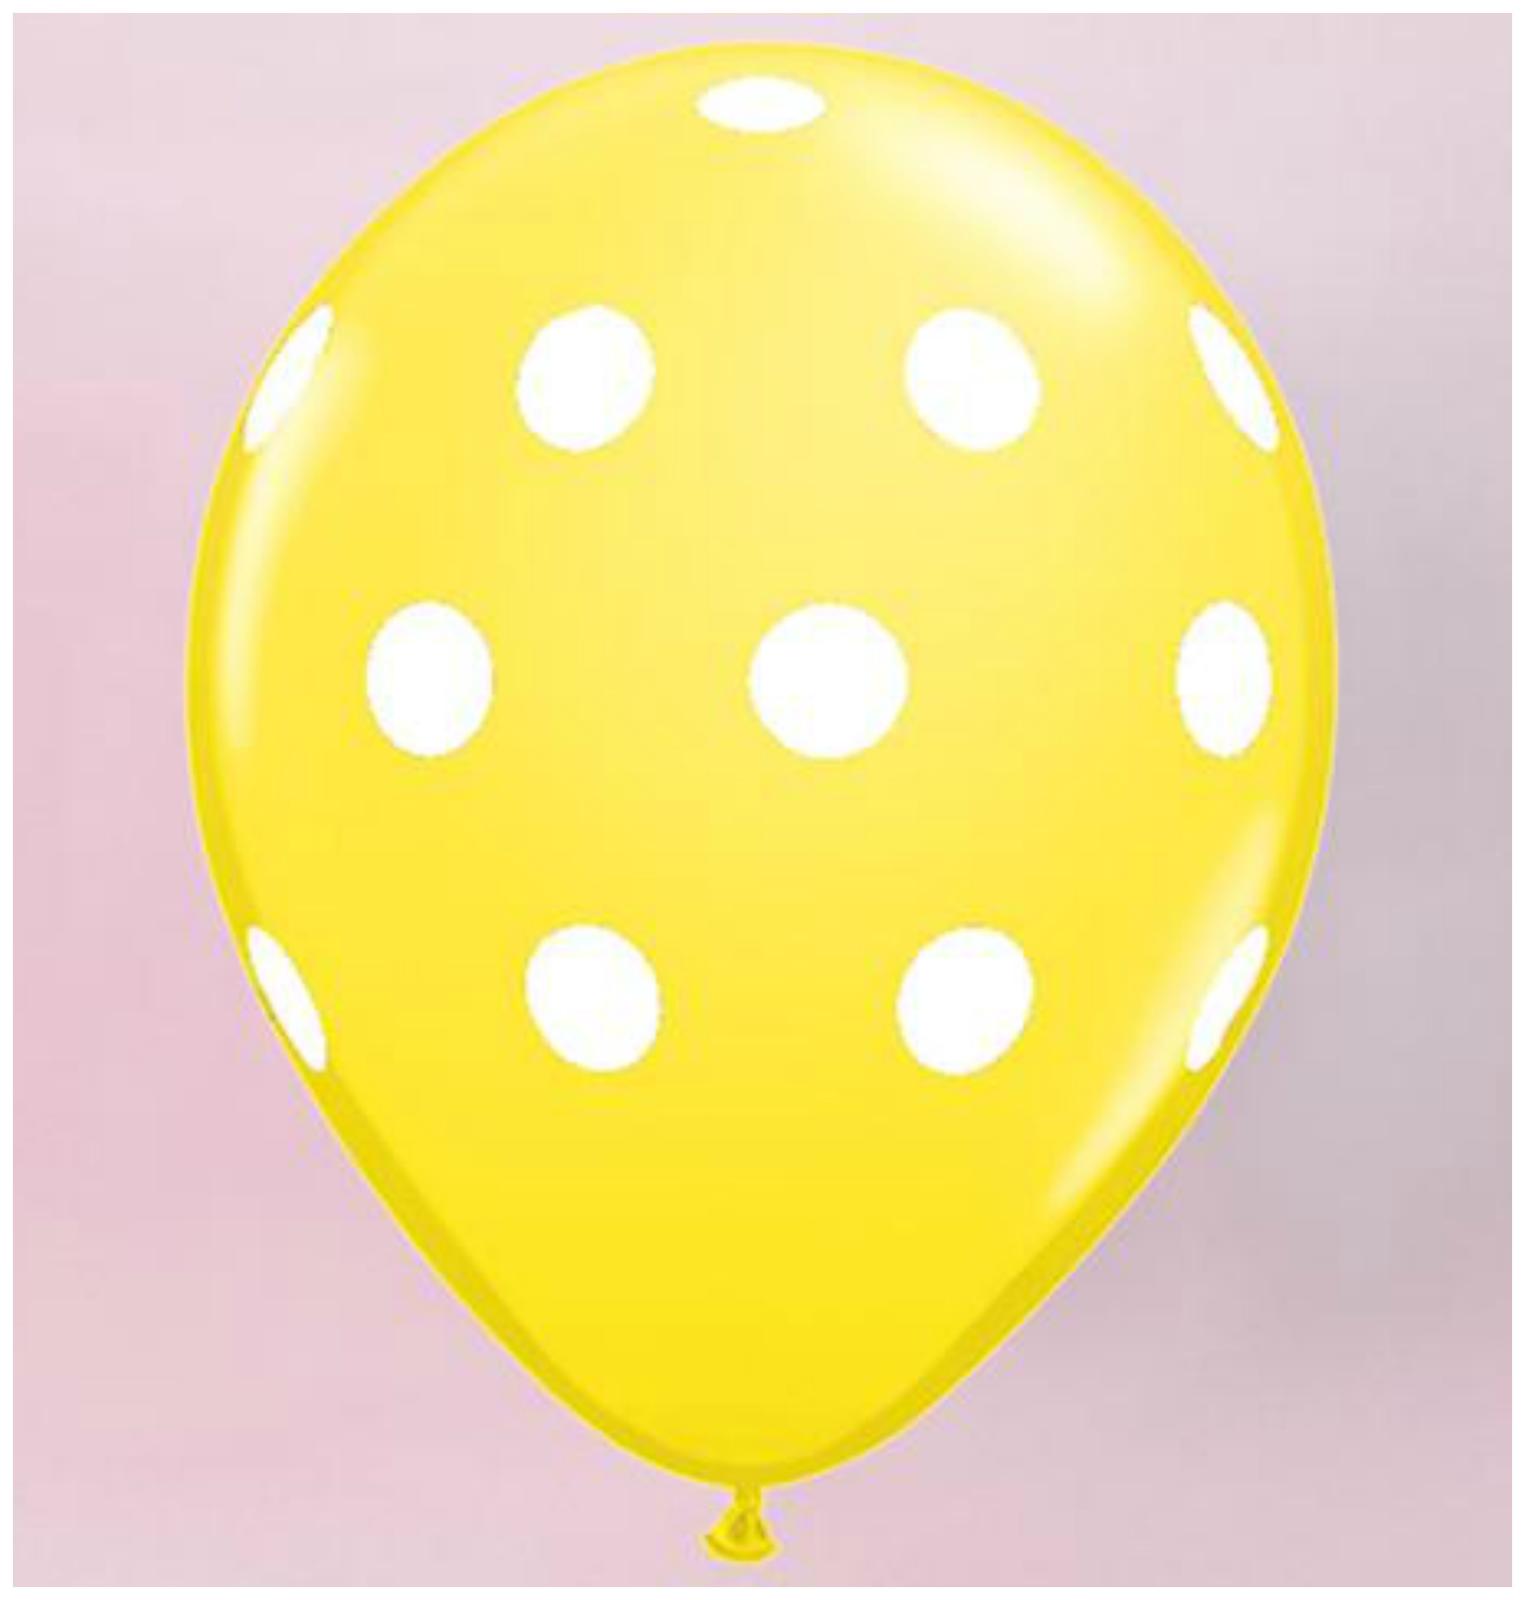 10-POUCE-gt-gt-SC-lt-lt-254cm-30-5cm-a-pois-Ballons-AIR-Helium-Balons-Ruban